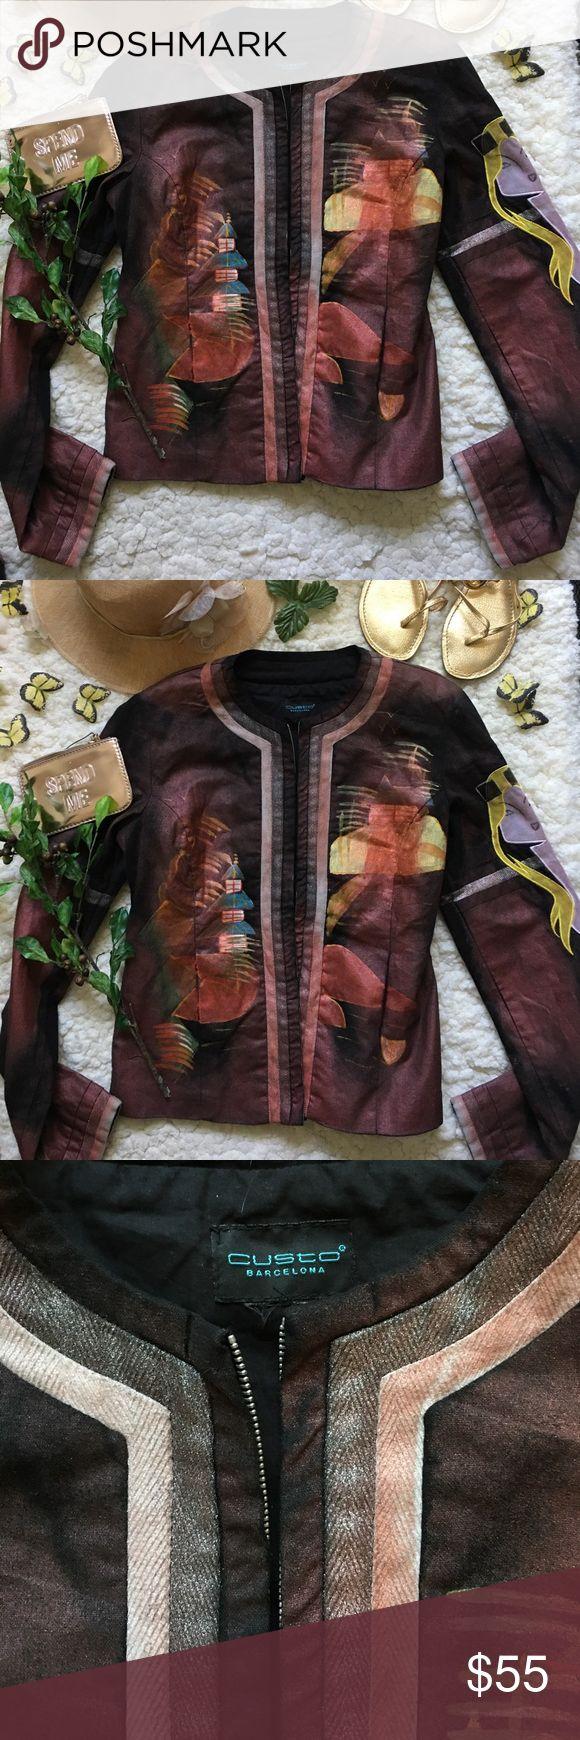 ❤Custo Barcelona Jacket❤ ❤In great used condition Jacket by Custo Barcelona In size 1❤ Custo Barcelona Jackets & Coats